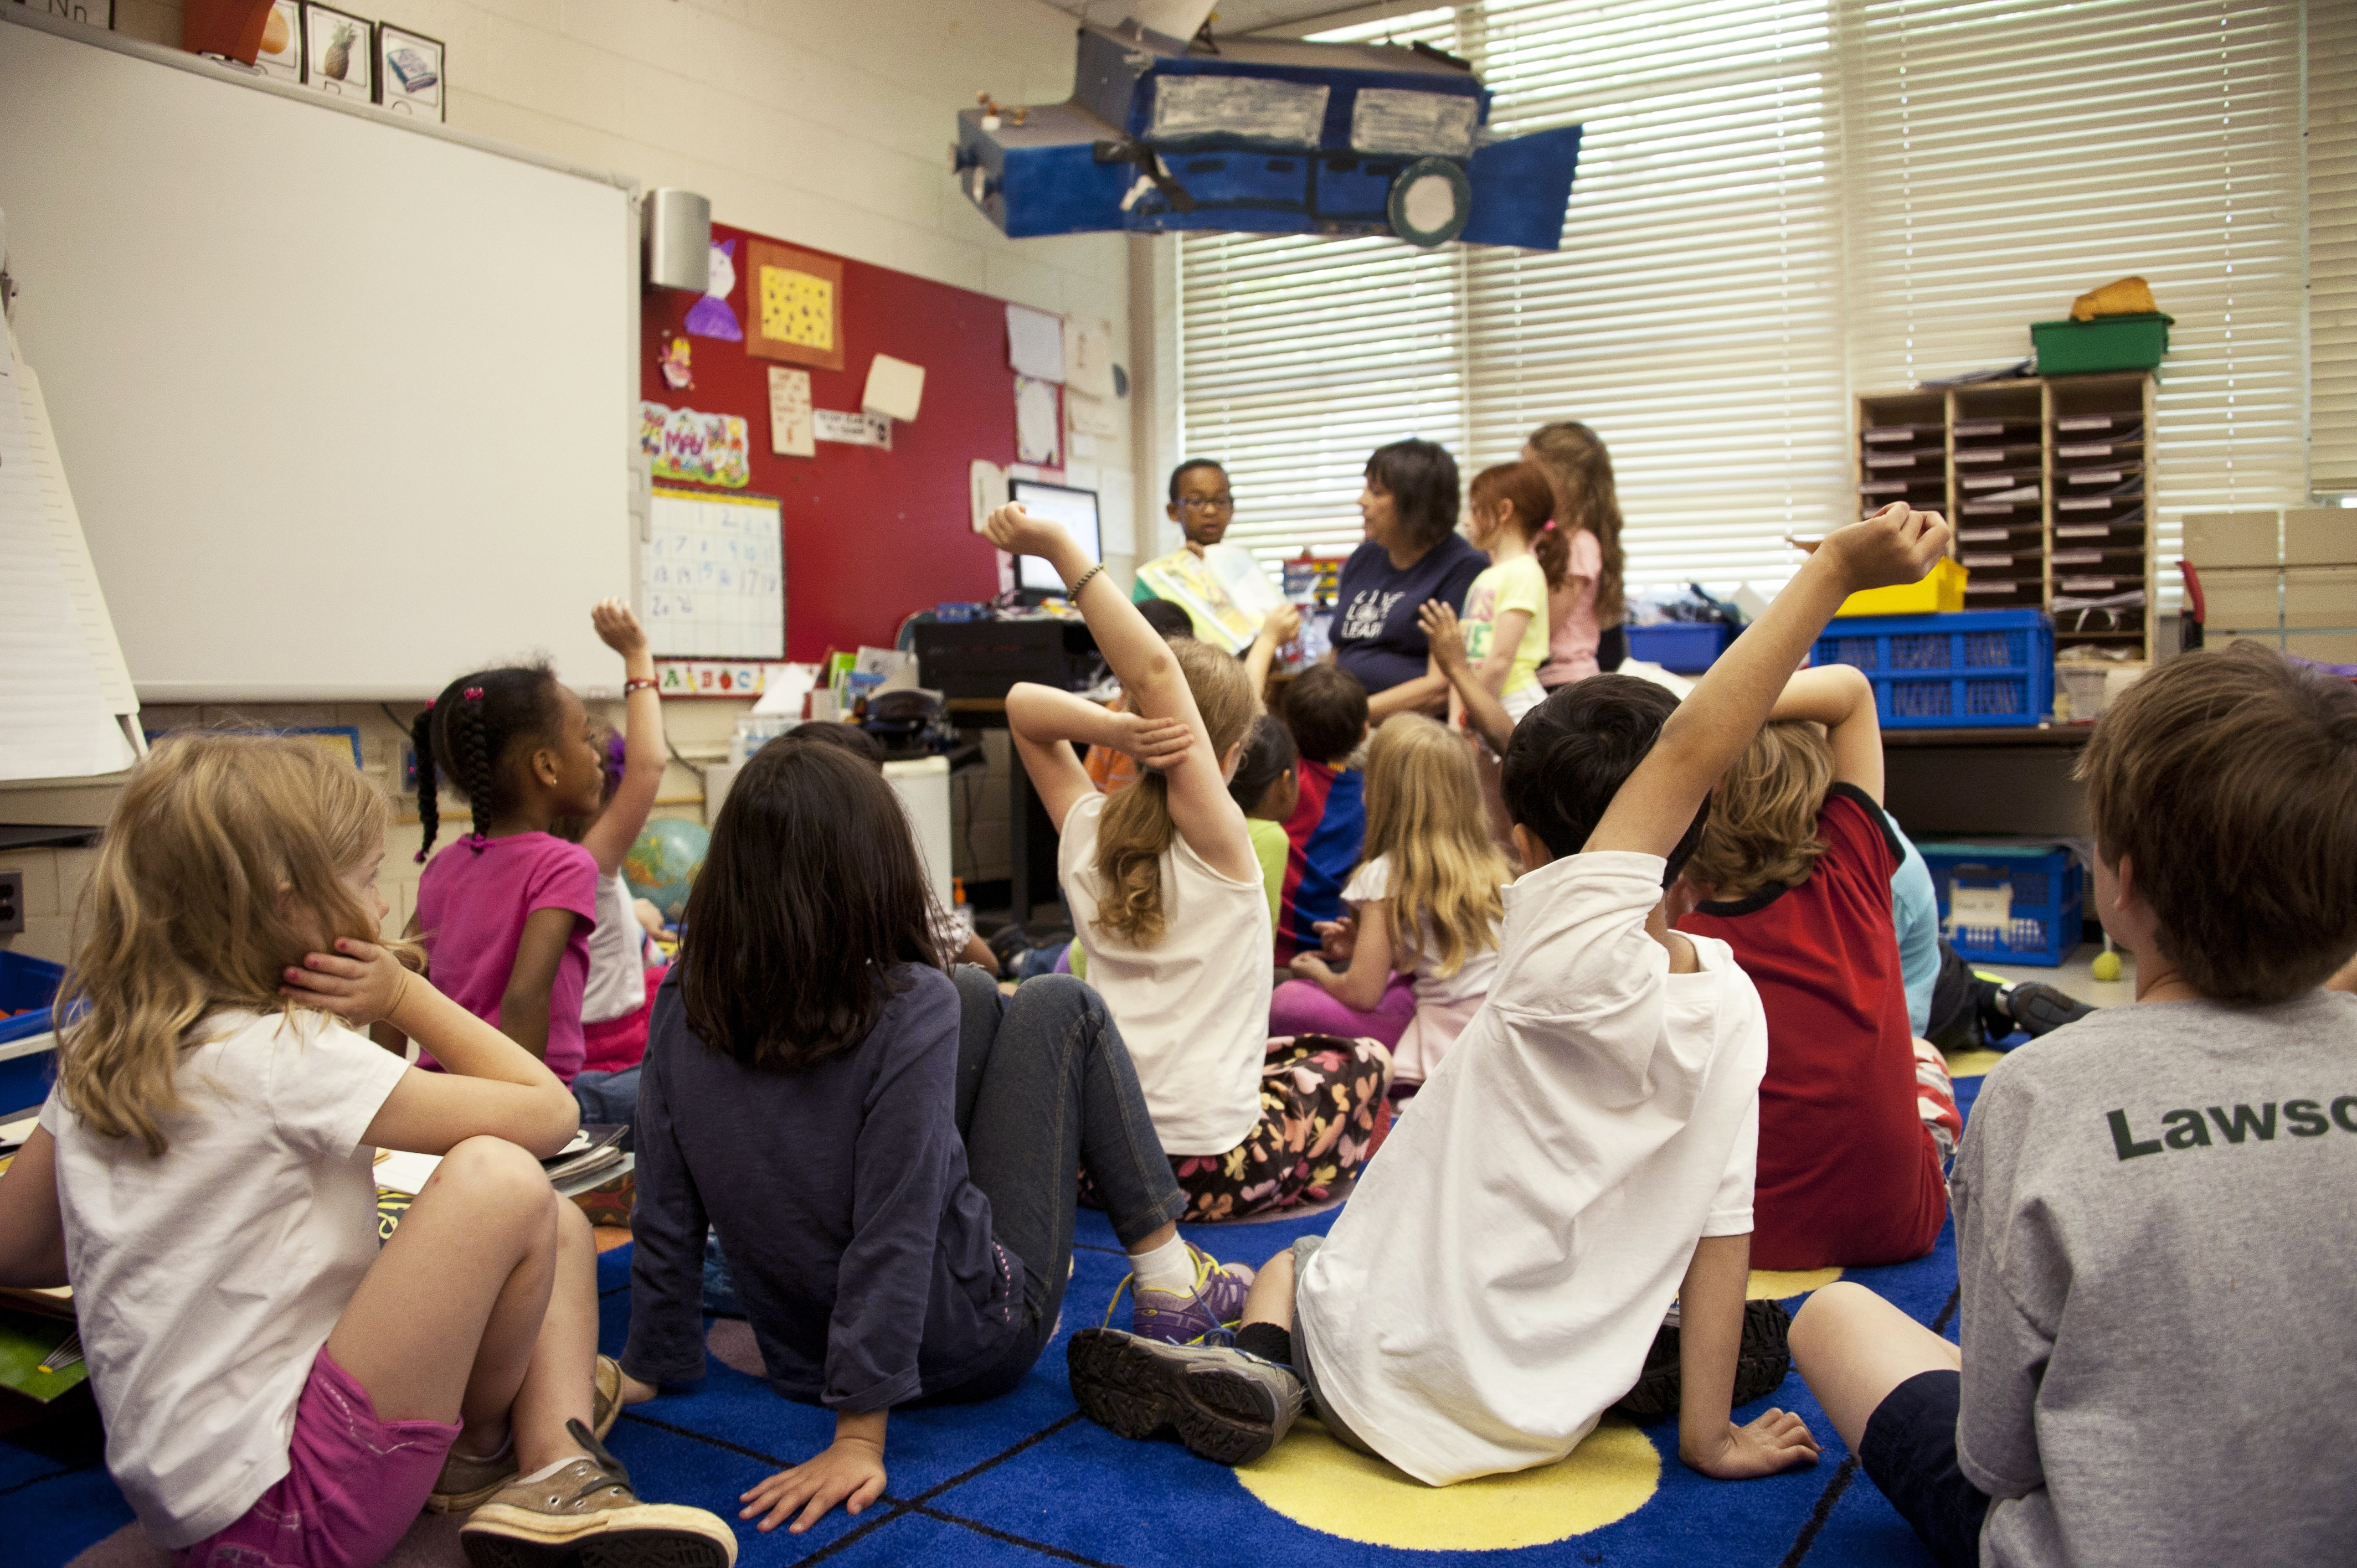 Grow Happier And Gain Purpose Through Volunteering